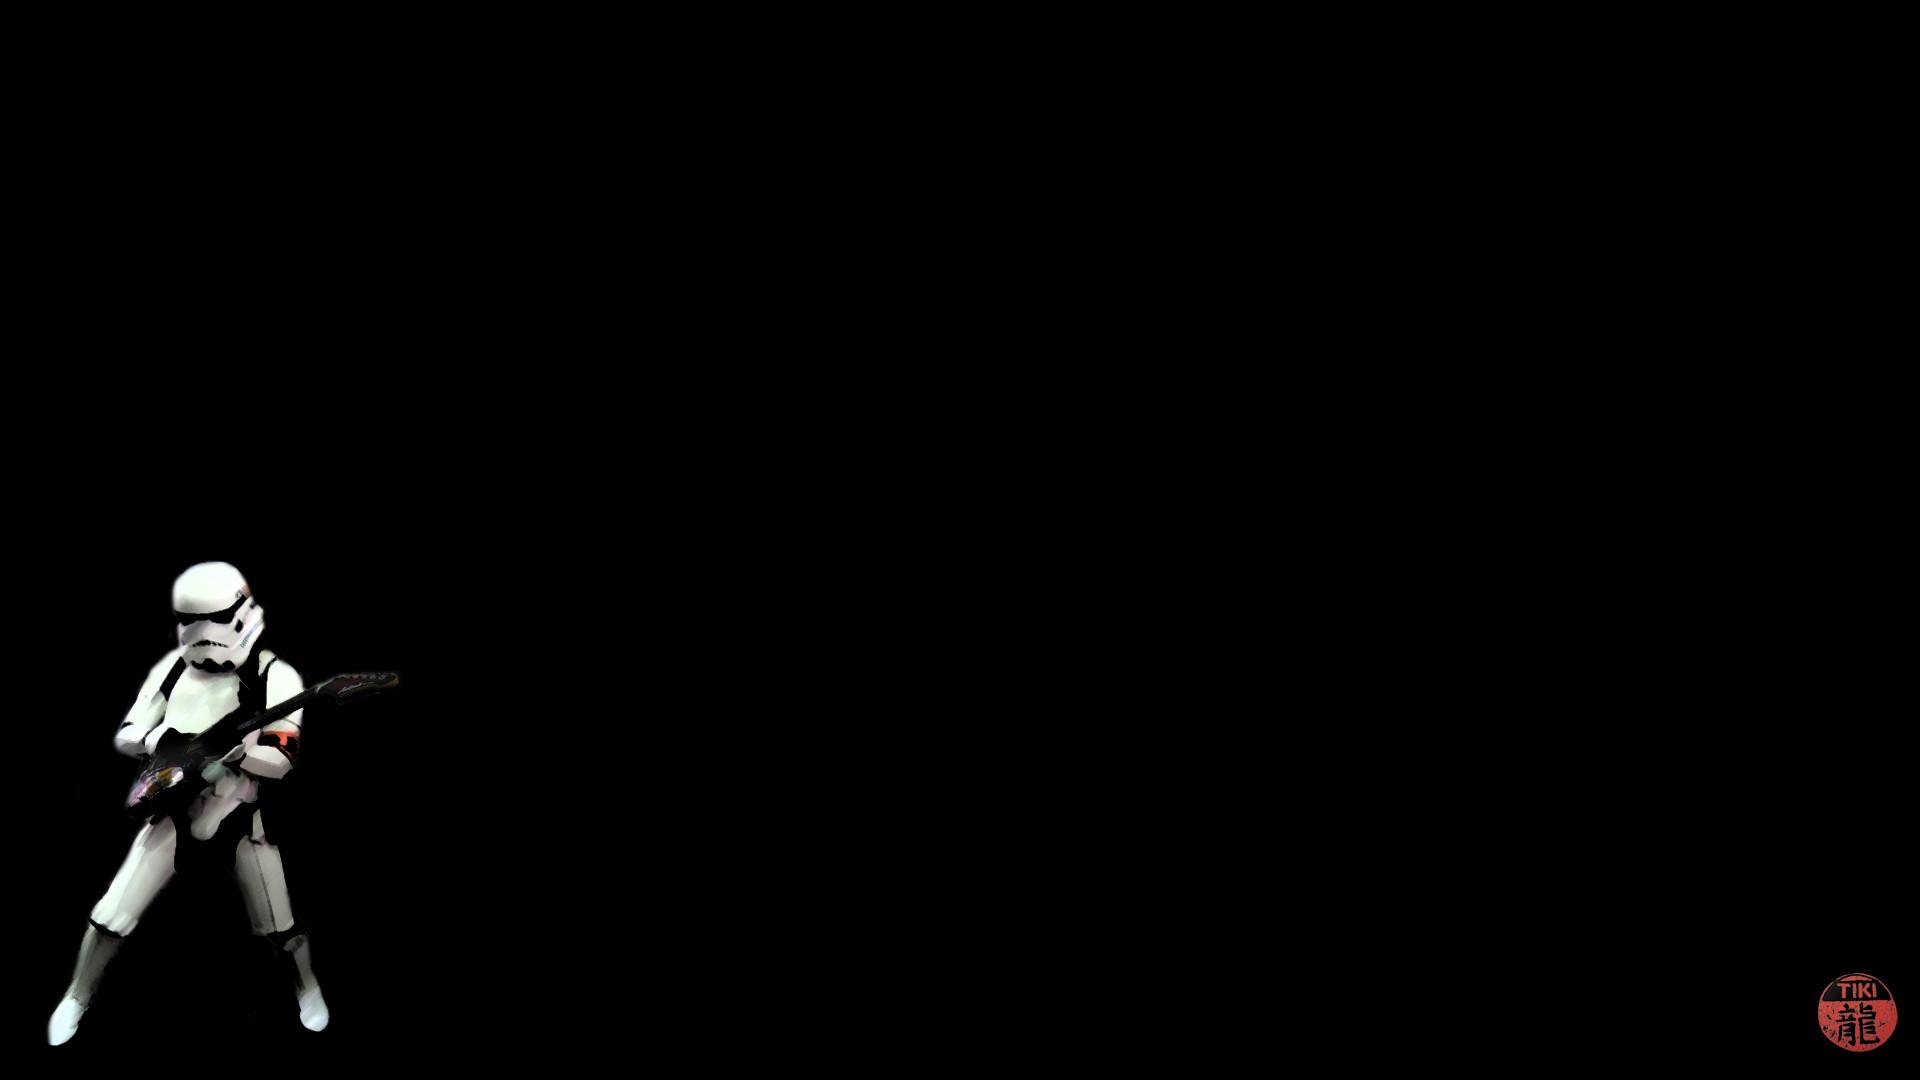 Star Wars Stormtroopers Guitars Black Background : Desktop and .